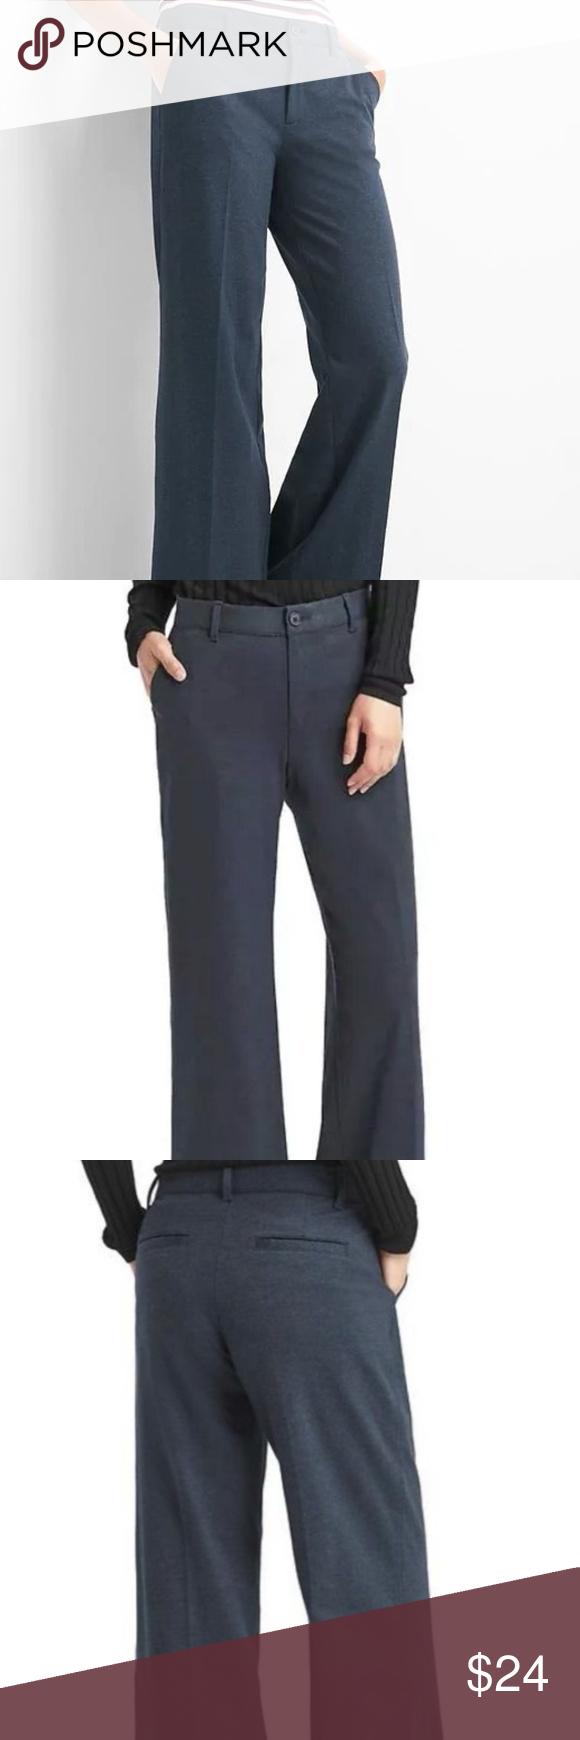 Gap Women/'s Navy Heather Wide-Leg Knit Pants Size 4 Tall